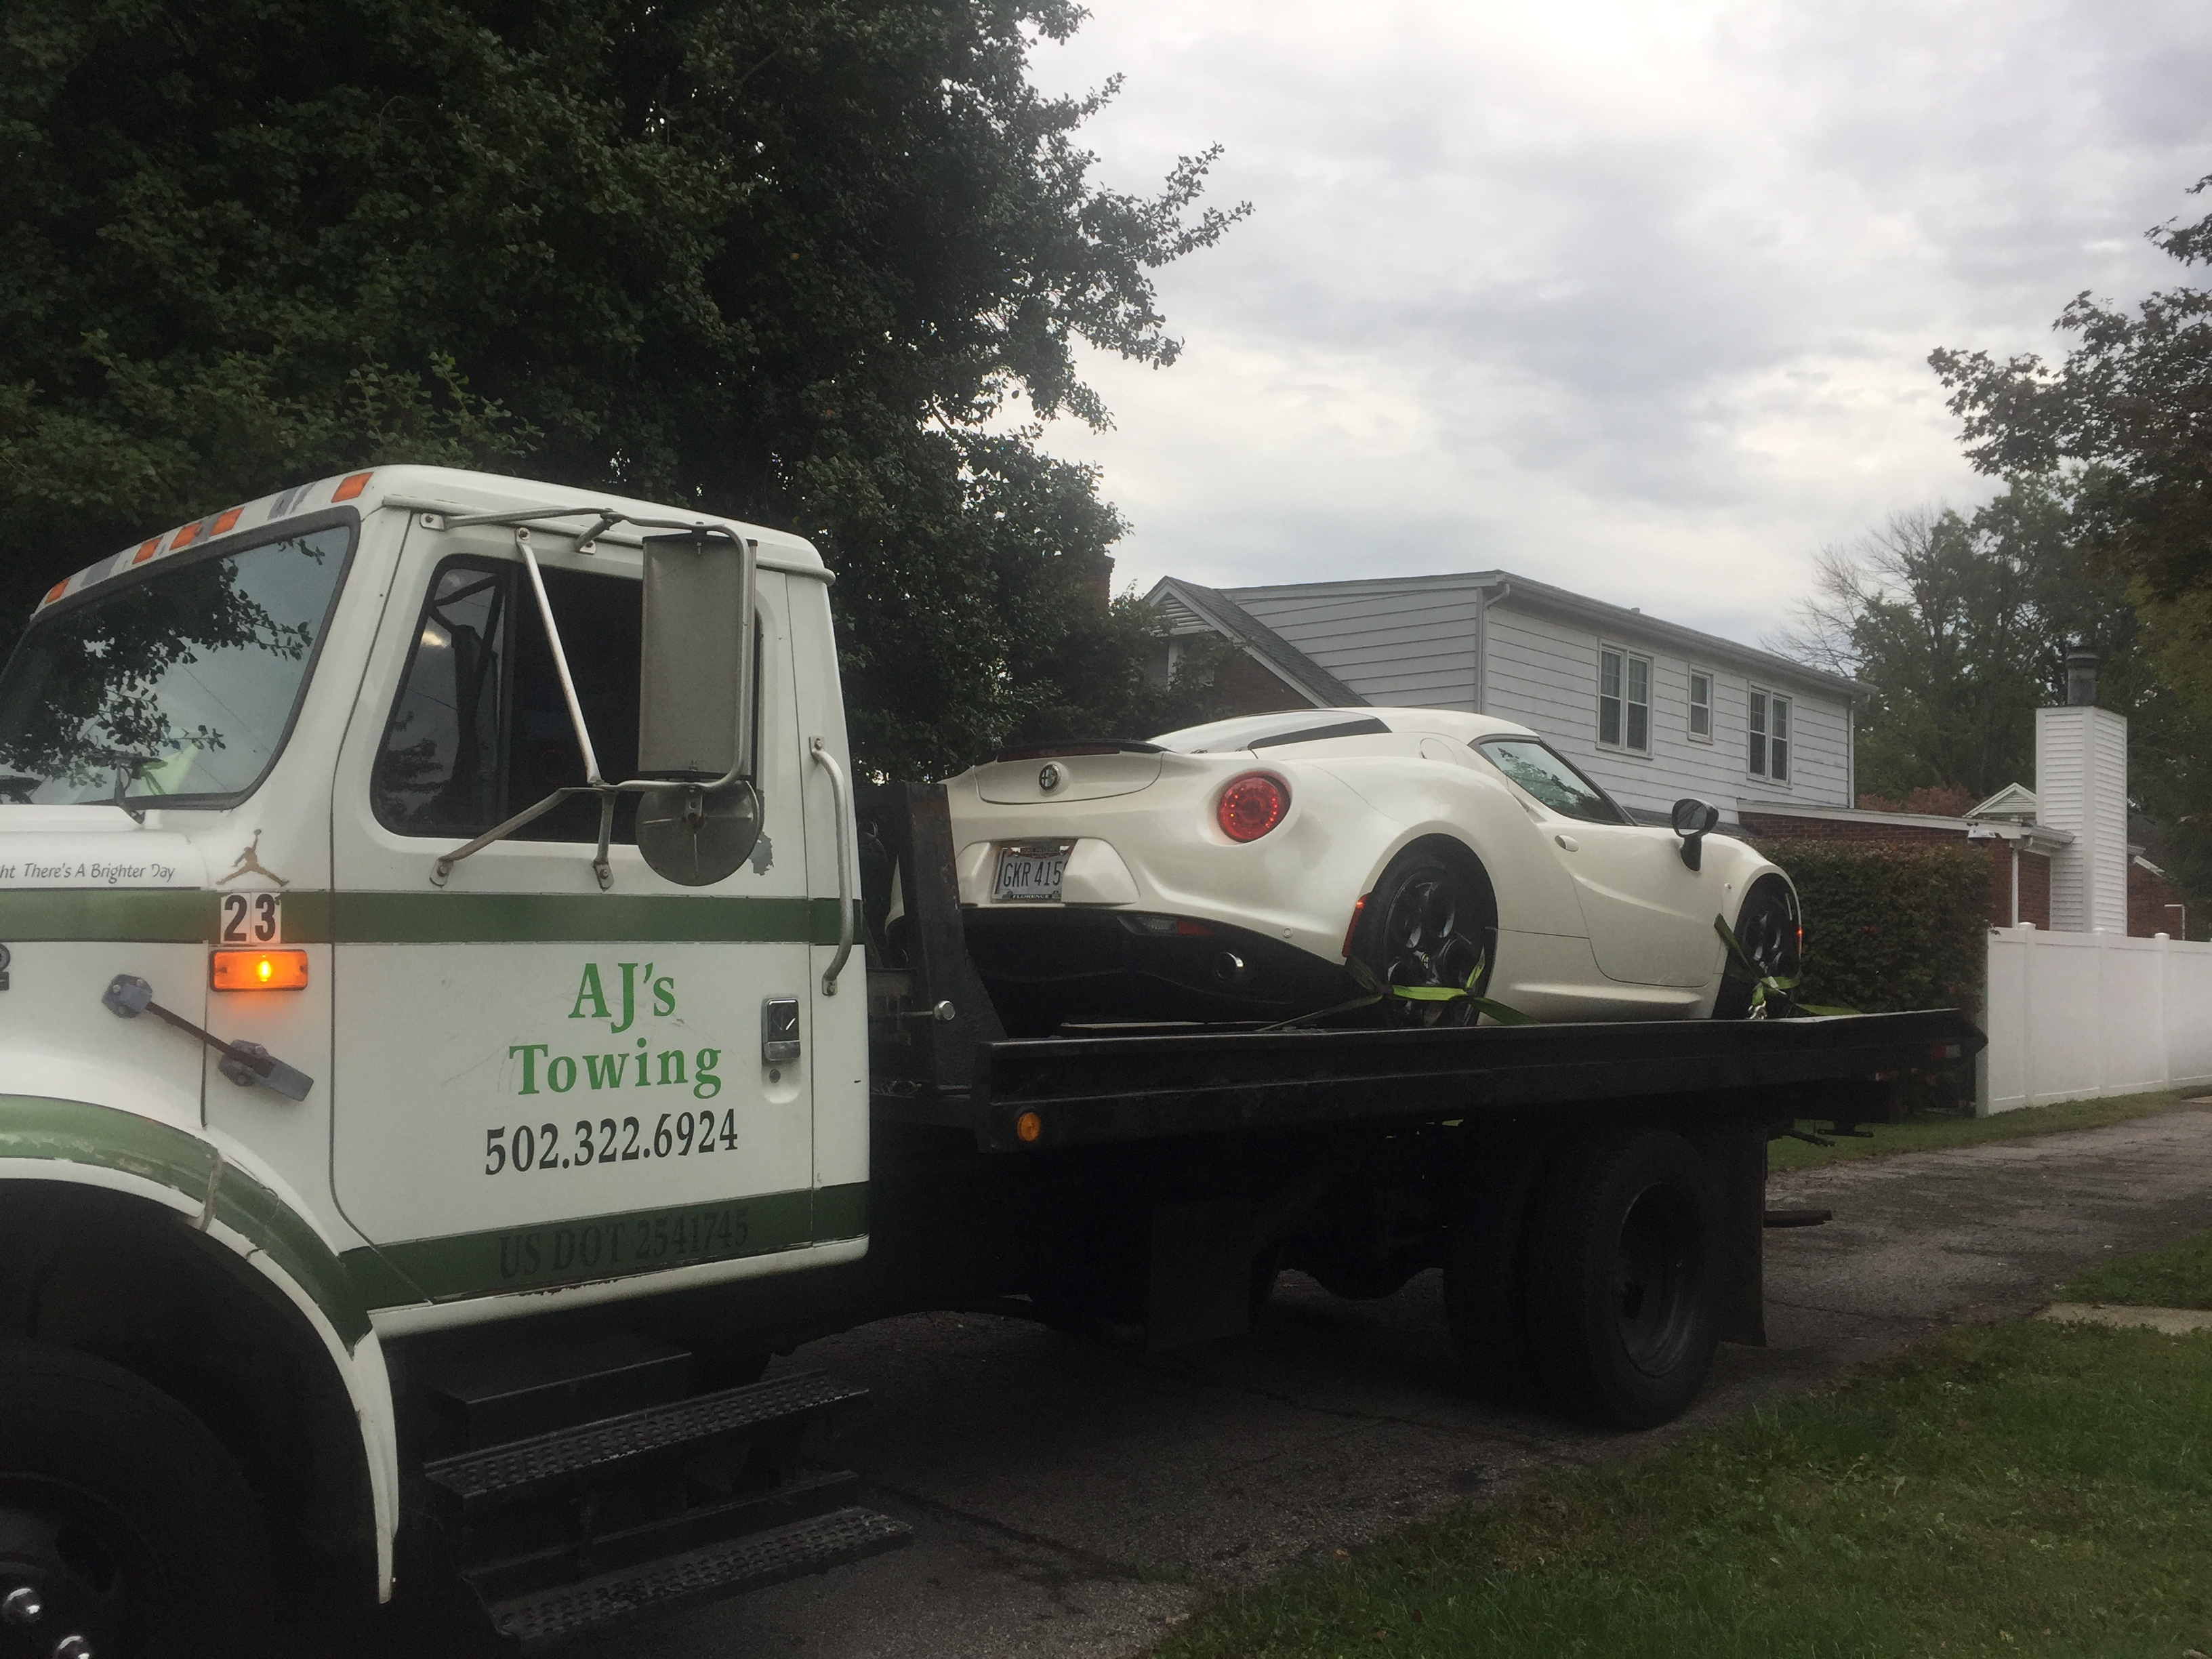 AJ's Towing Service image 29